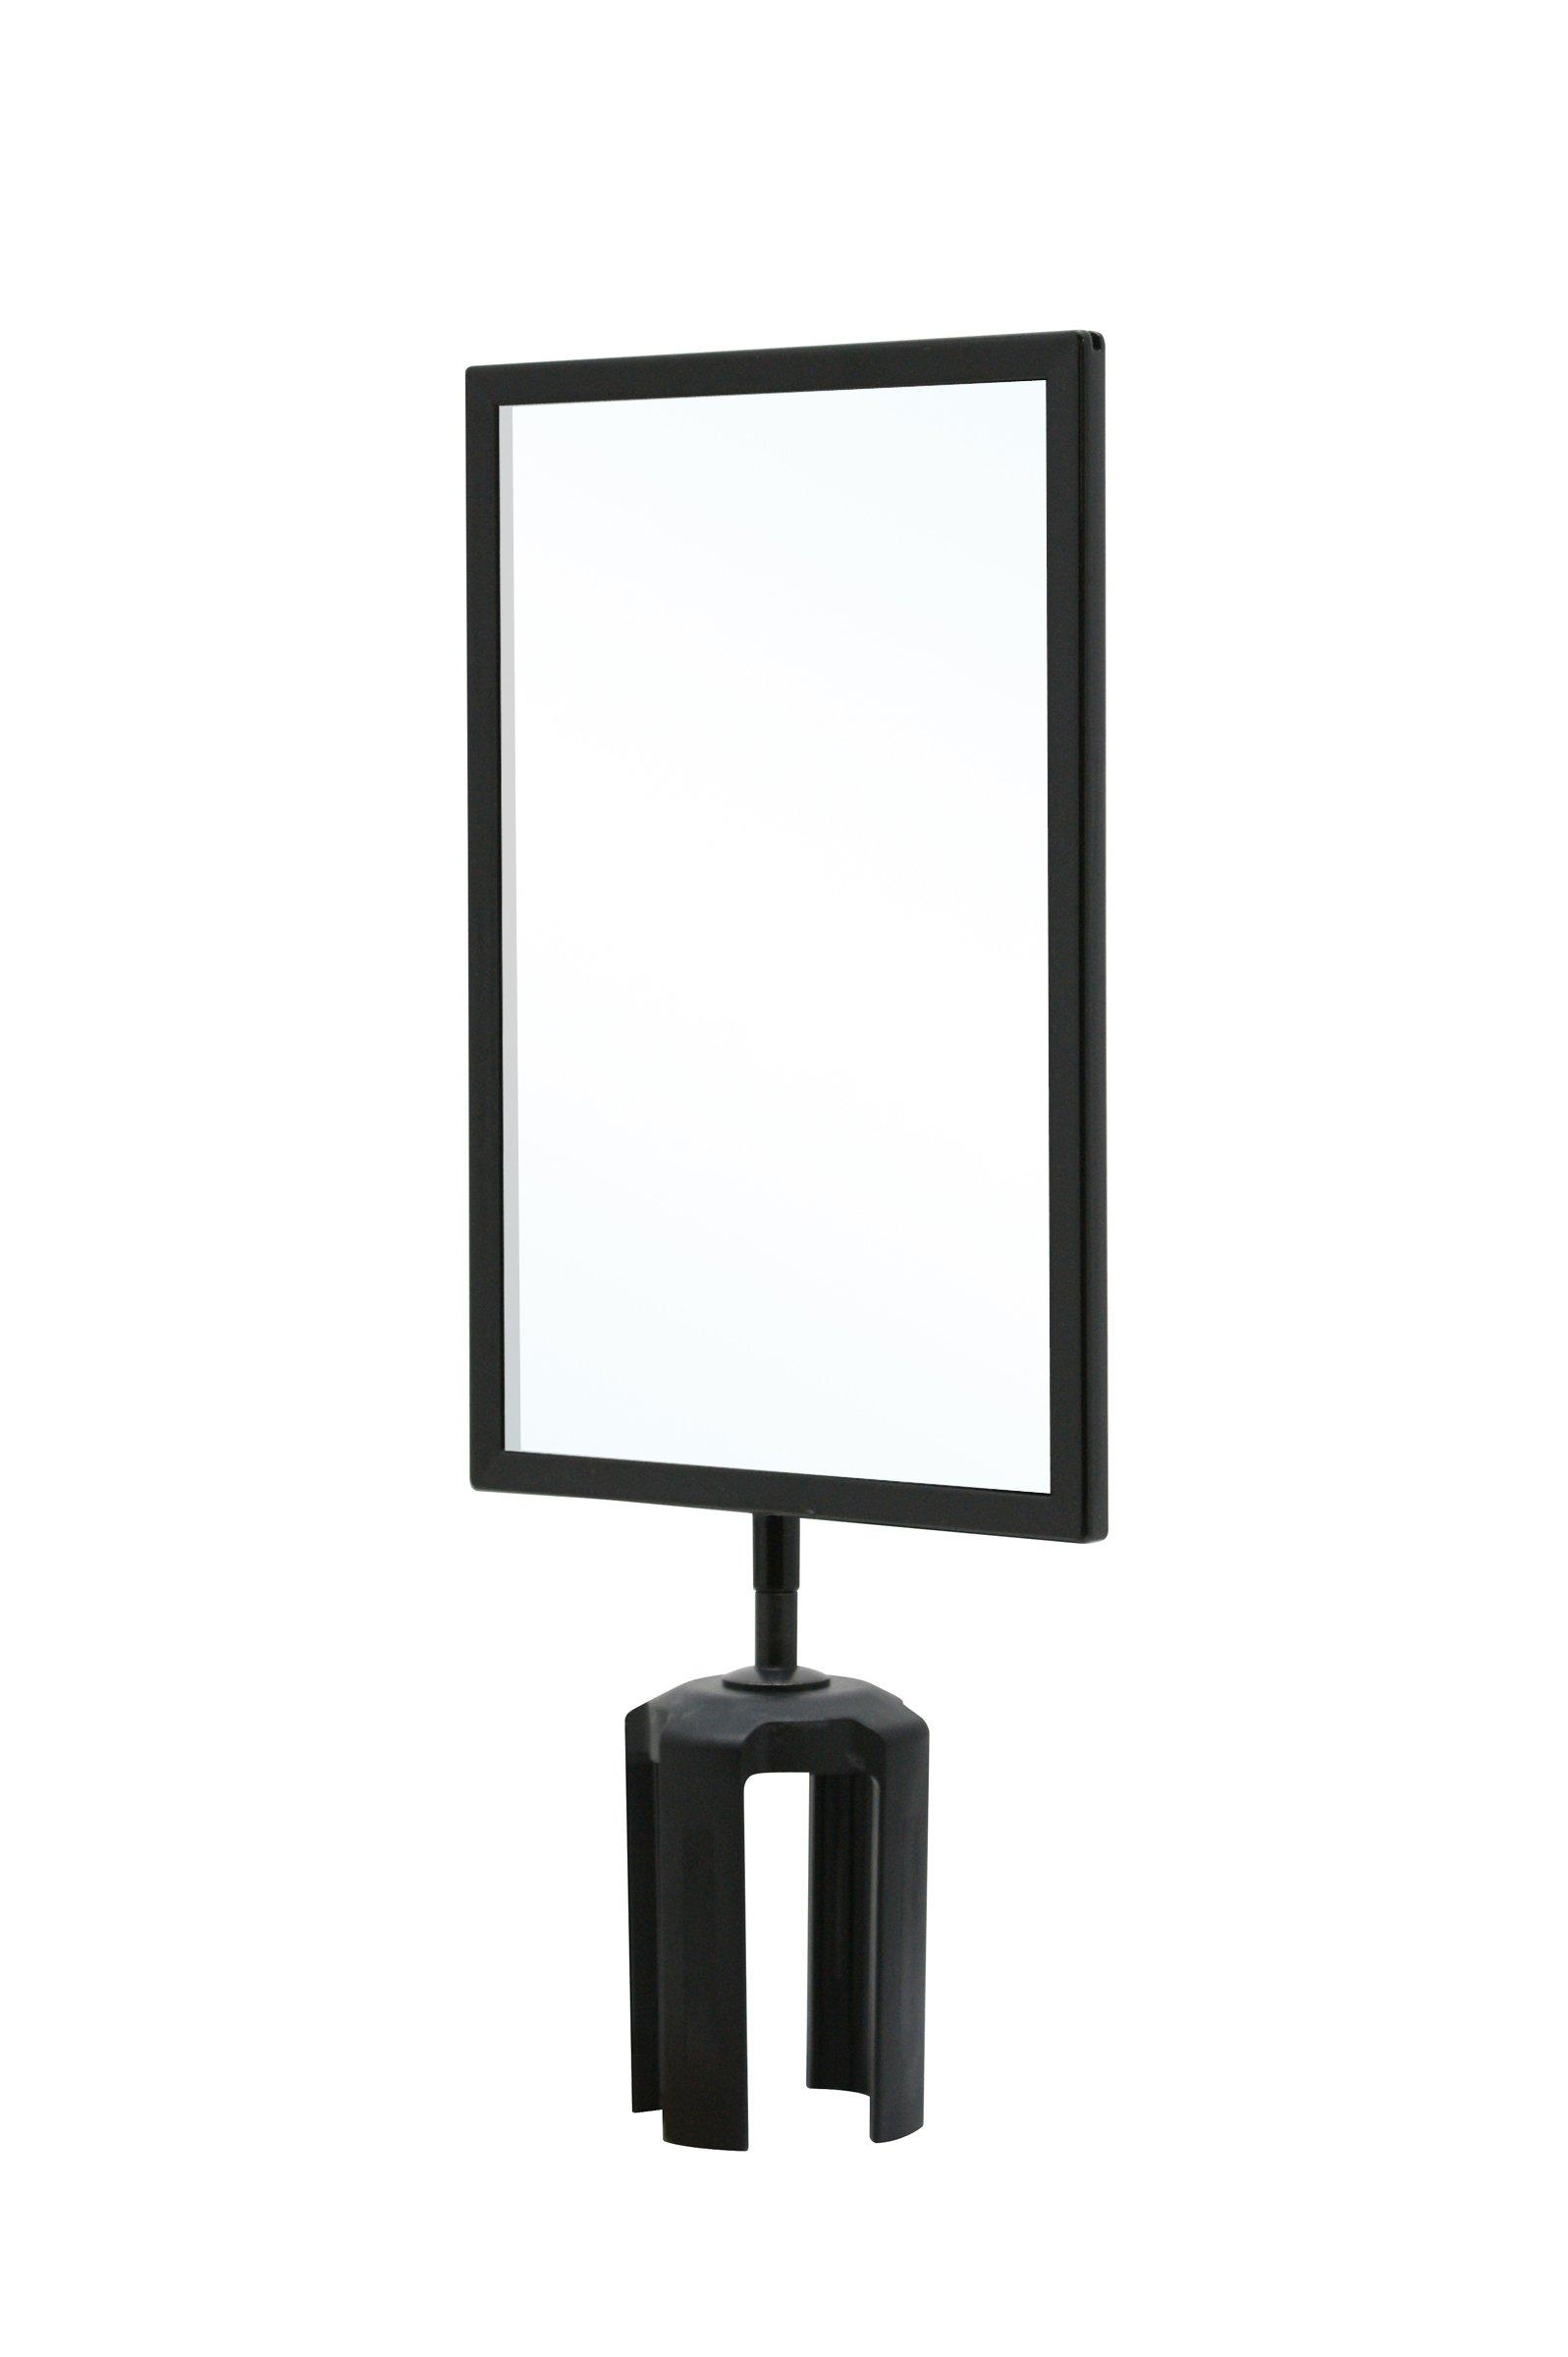 Queueway QWAYSIGN-7'' X 11'' -BLANK SIGN FRAME Blank Sign Frame, Clear Acrylics, 7'' x 11''